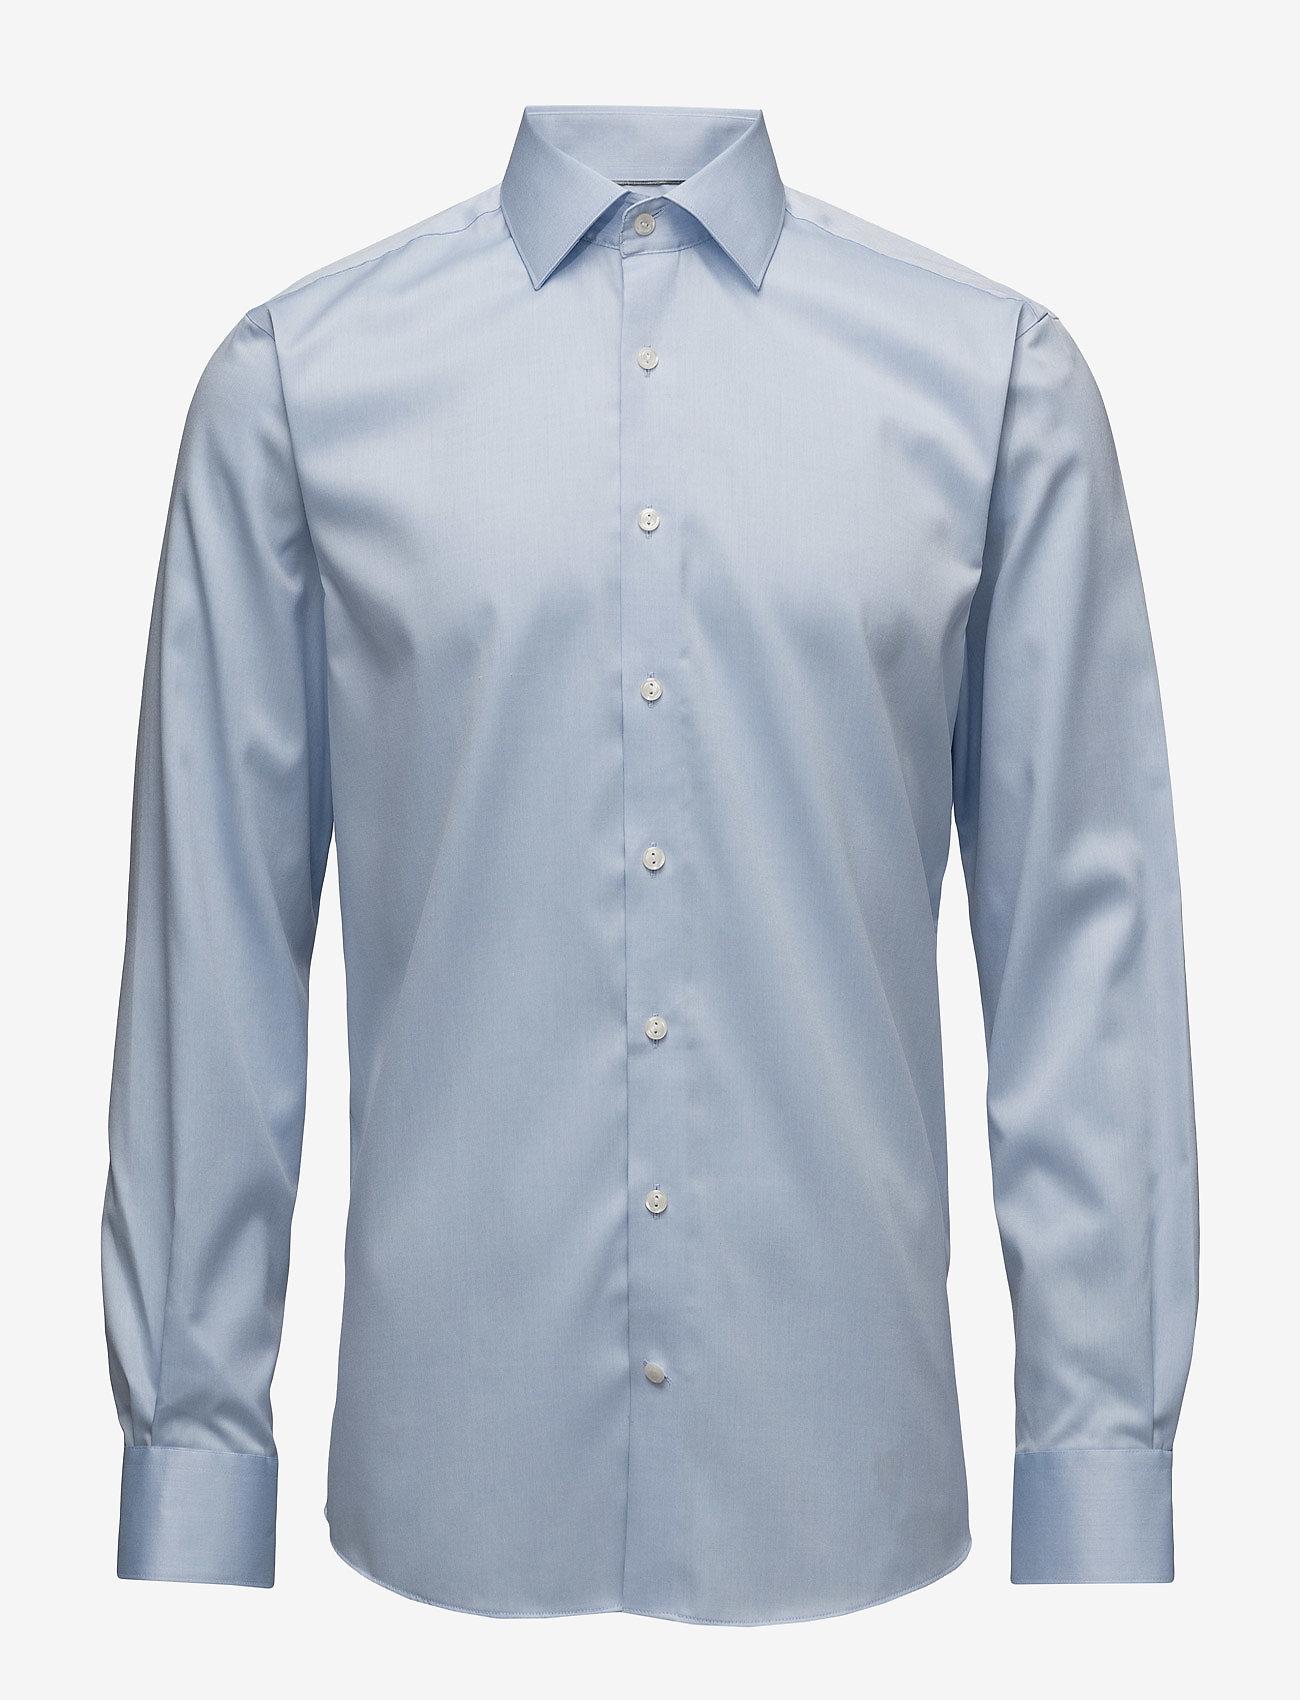 Lindbergh - Plain fine twill shirt, WF - podstawowe koszulki - lt blue - 1